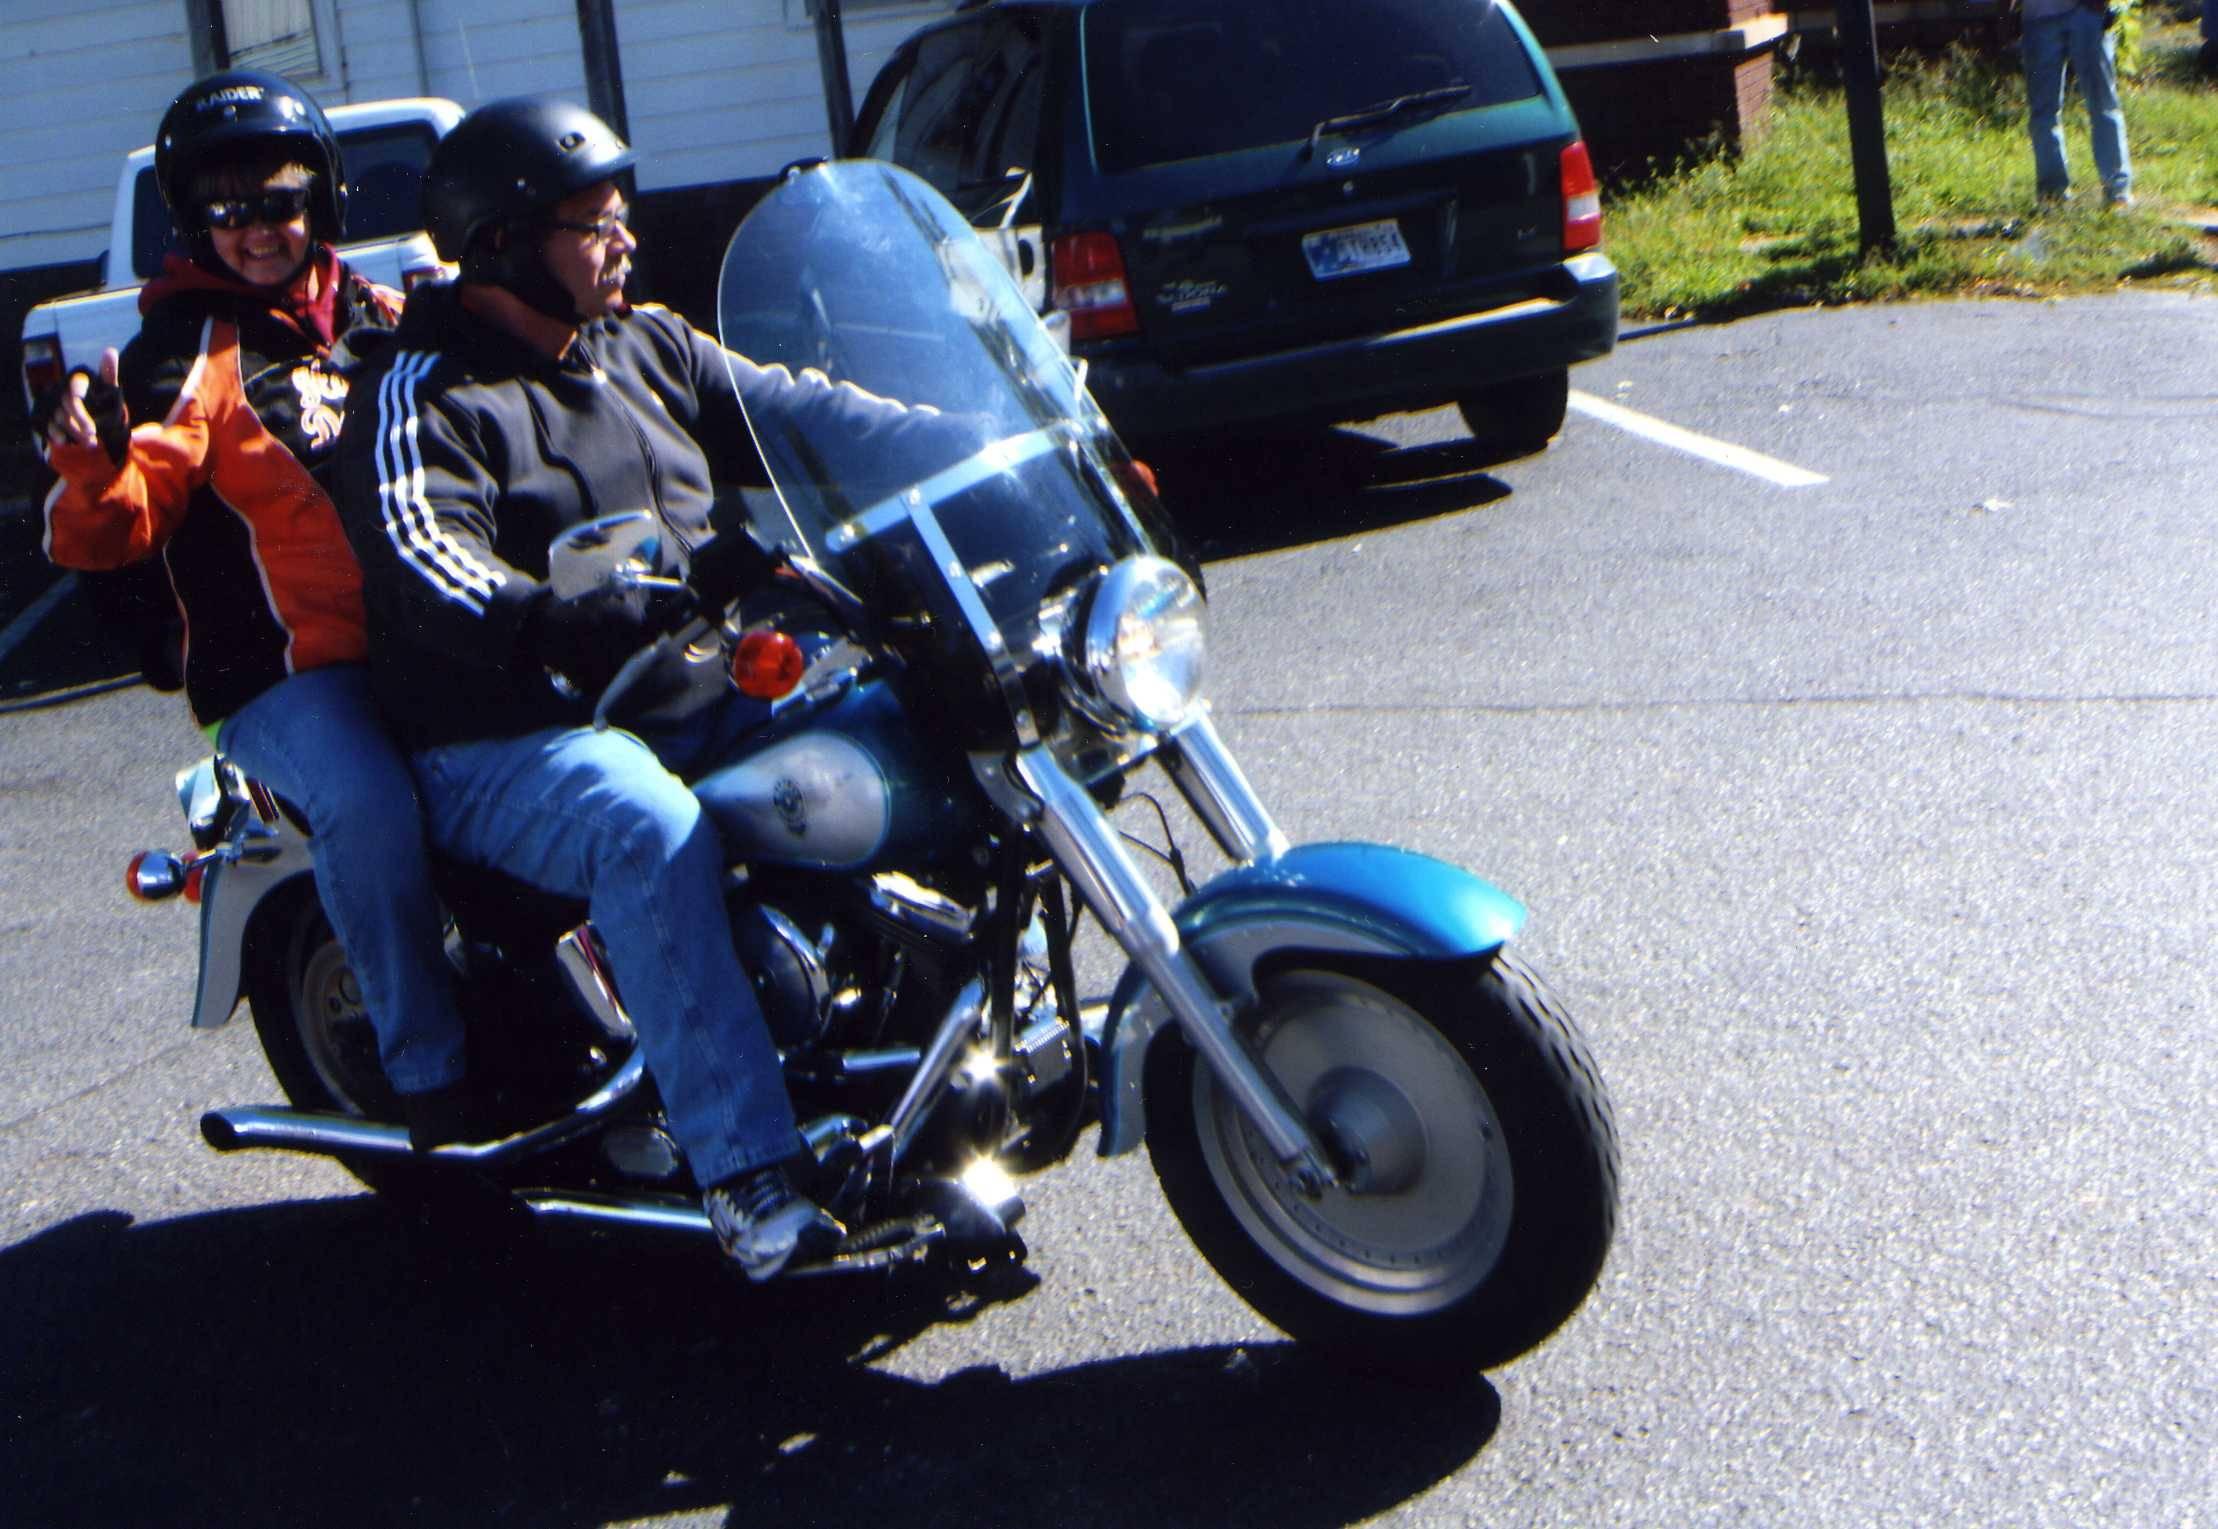 Riders leaving the Moose Lodge.